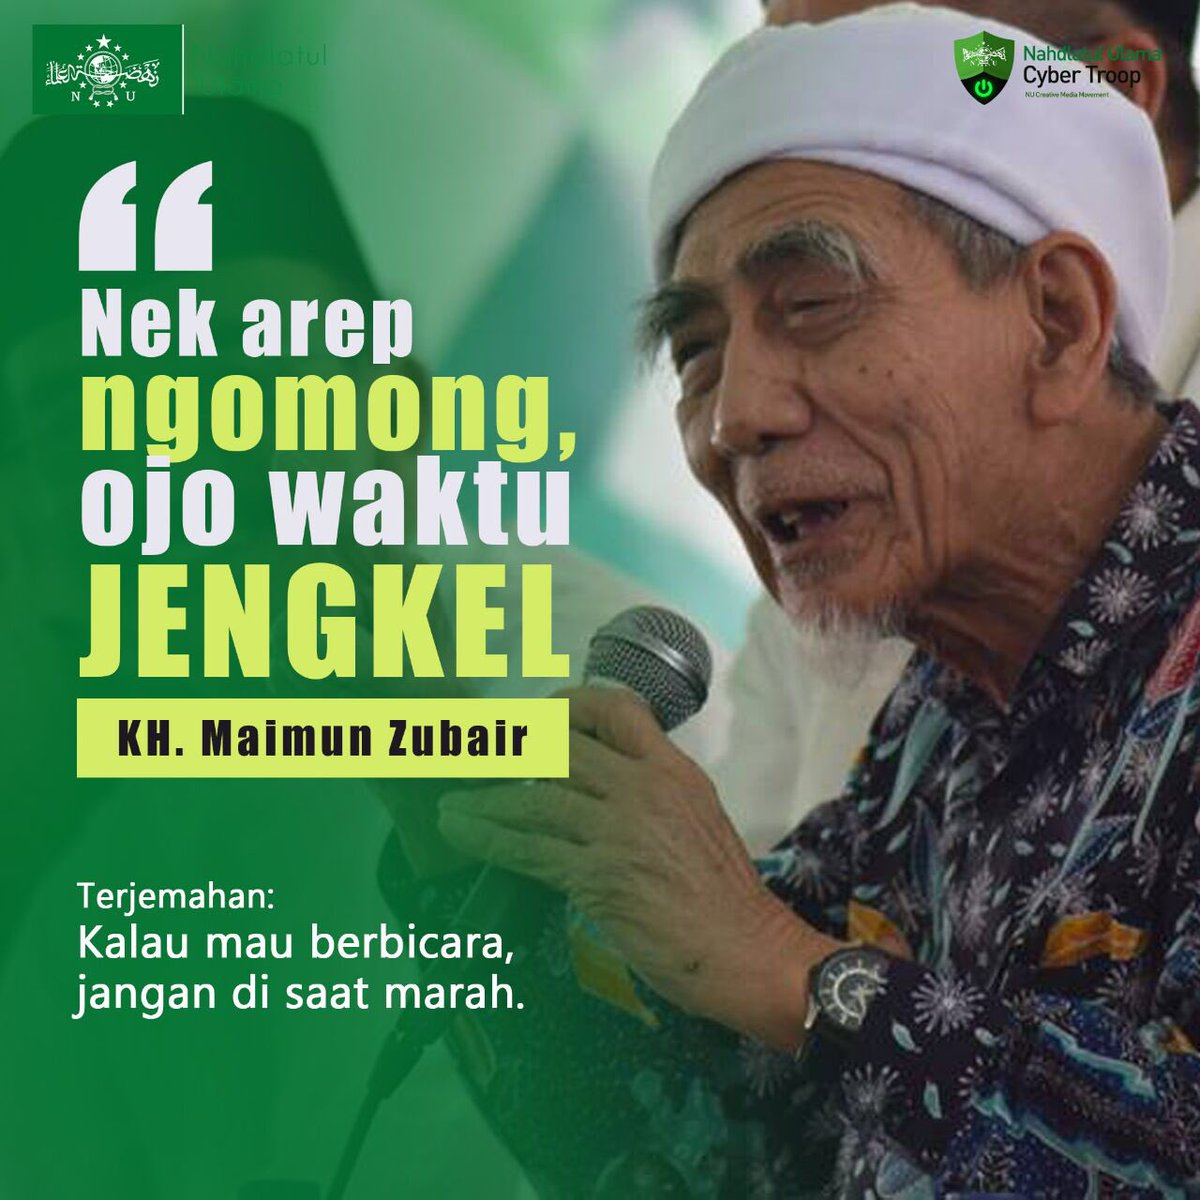 RT @Netizen_NU: Assalamualaikum. Mari simak dawuh Mbah Maimun Zubaer. Jangan mudah marah. https://t.co/wP0HskgmqX